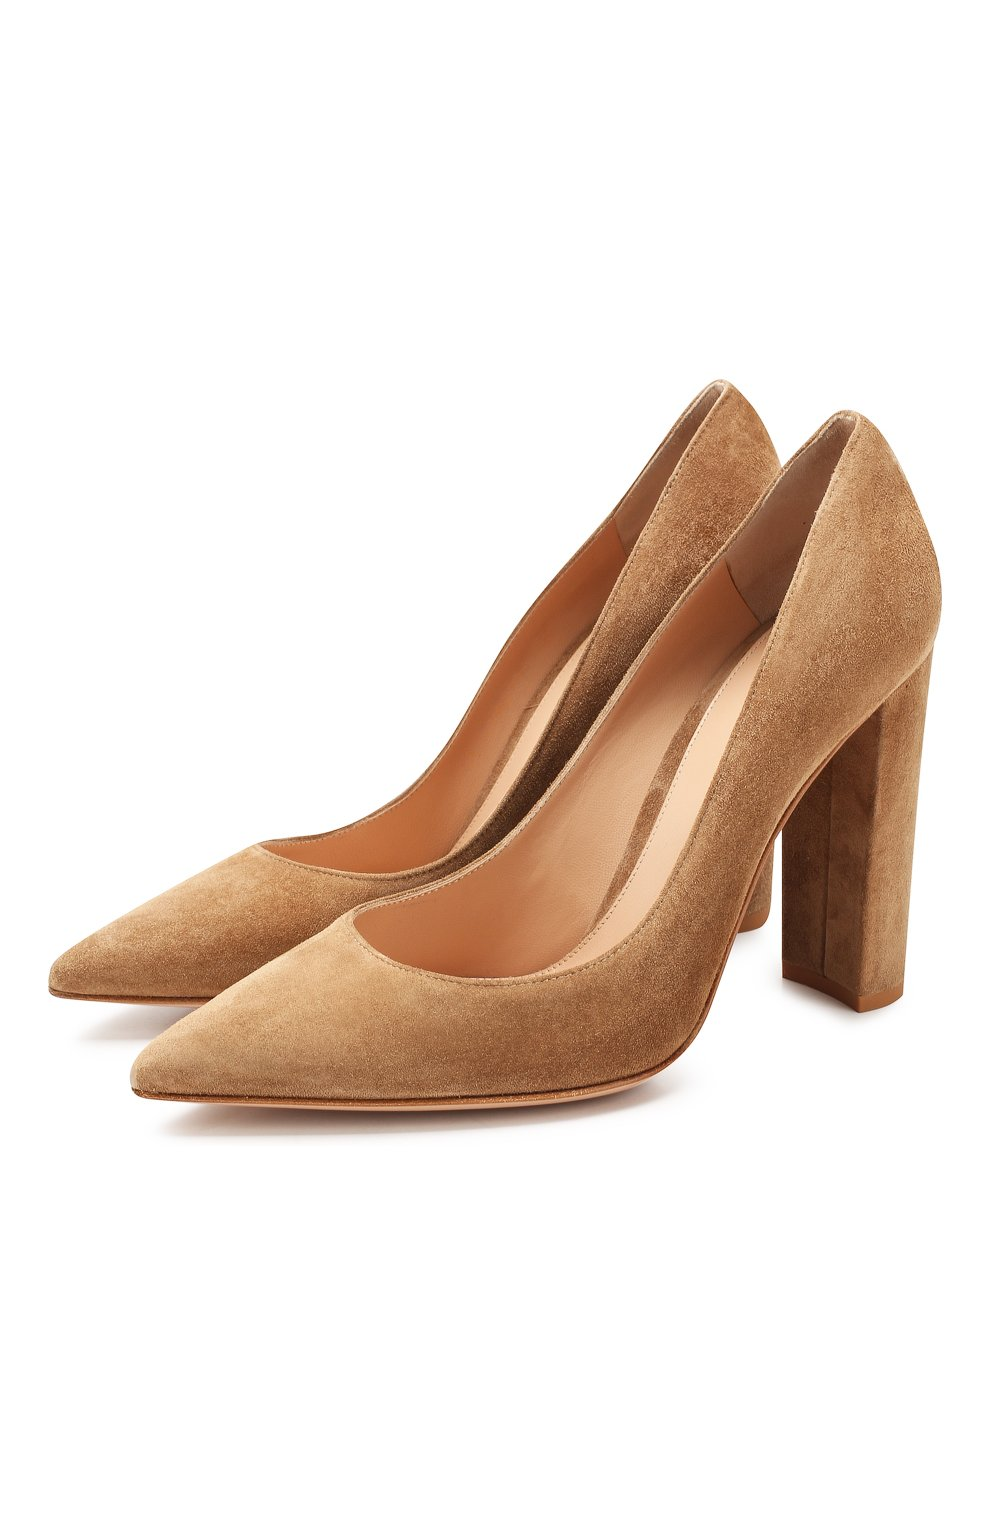 Замшевые туфли Piper  | Фото №1